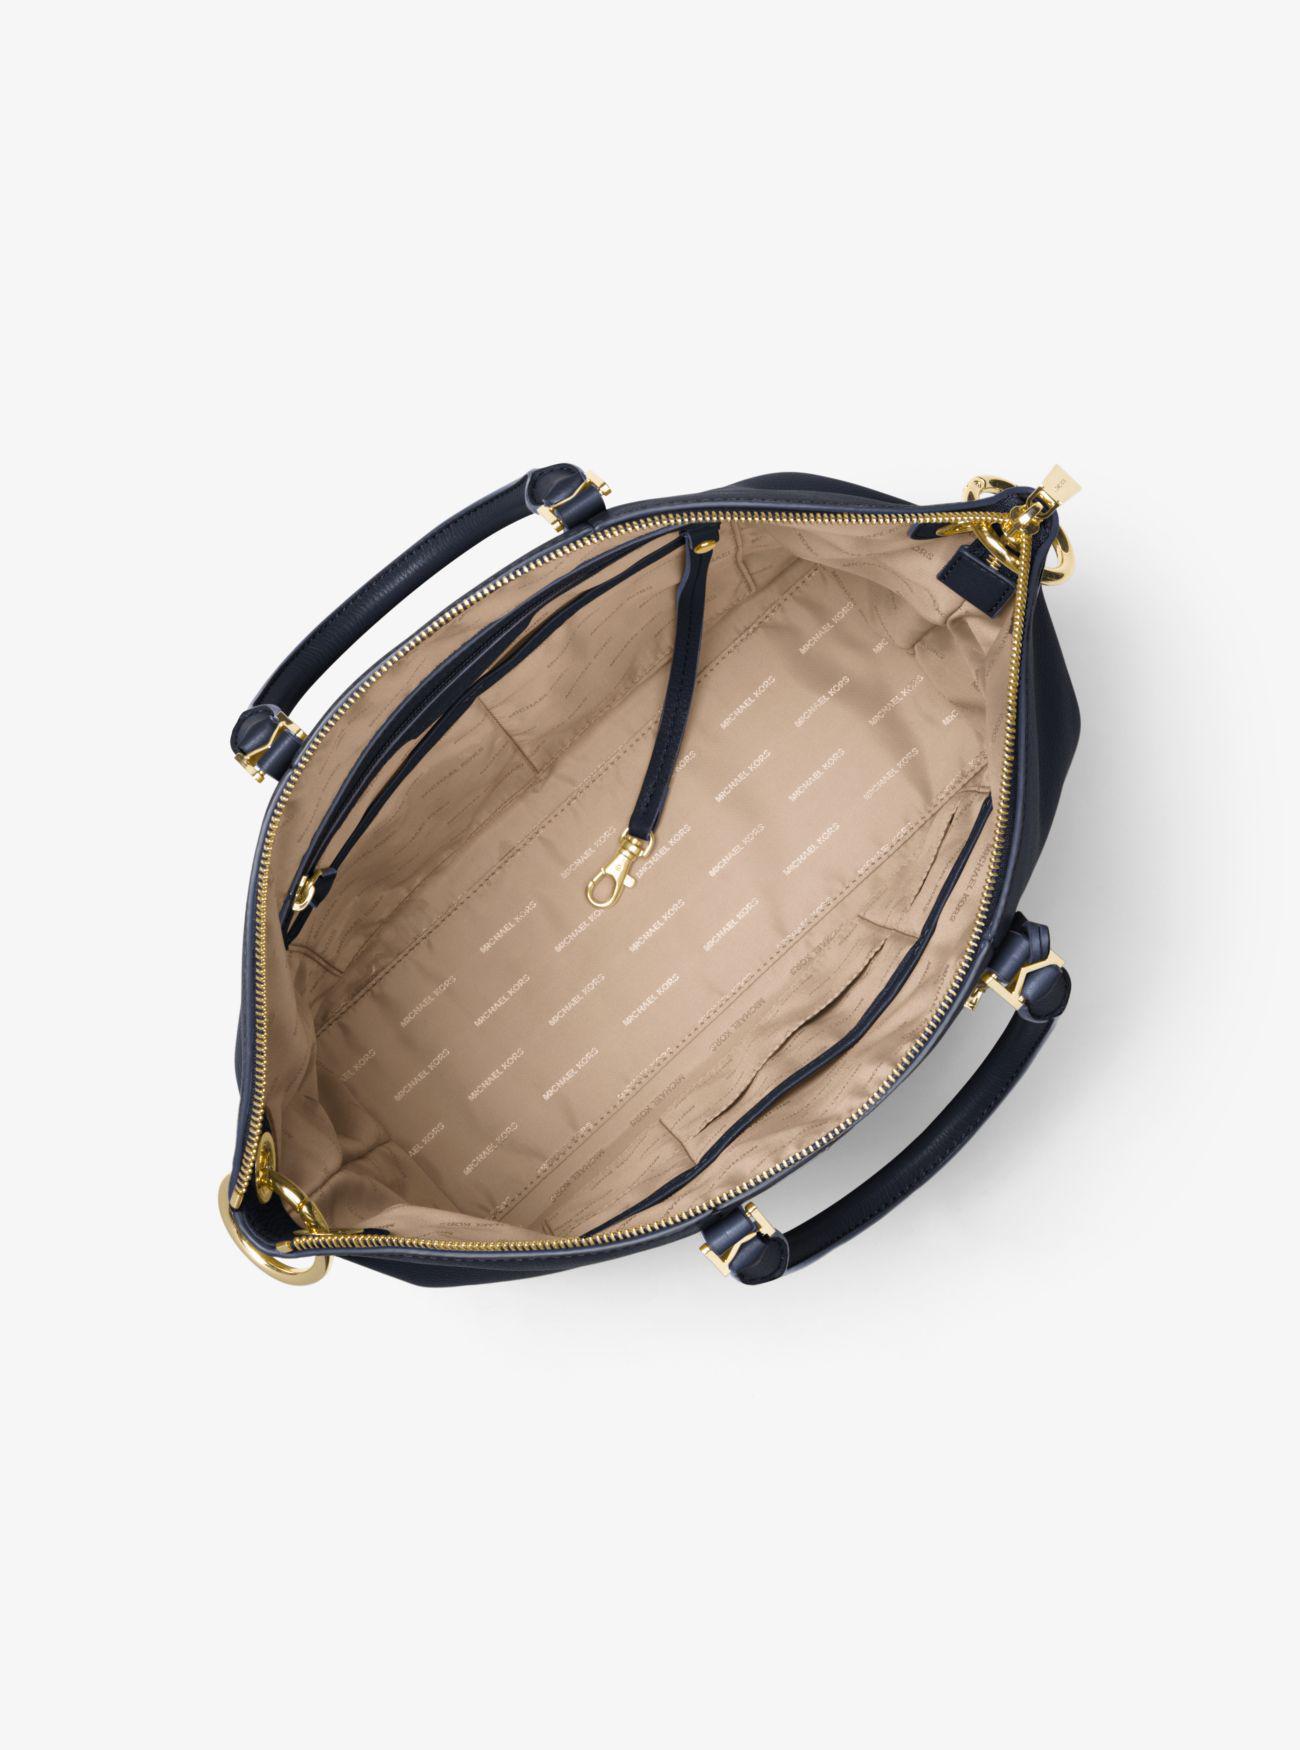 4079d109f6 Lyst - Michael Kors Beckett Large Leather Satchel